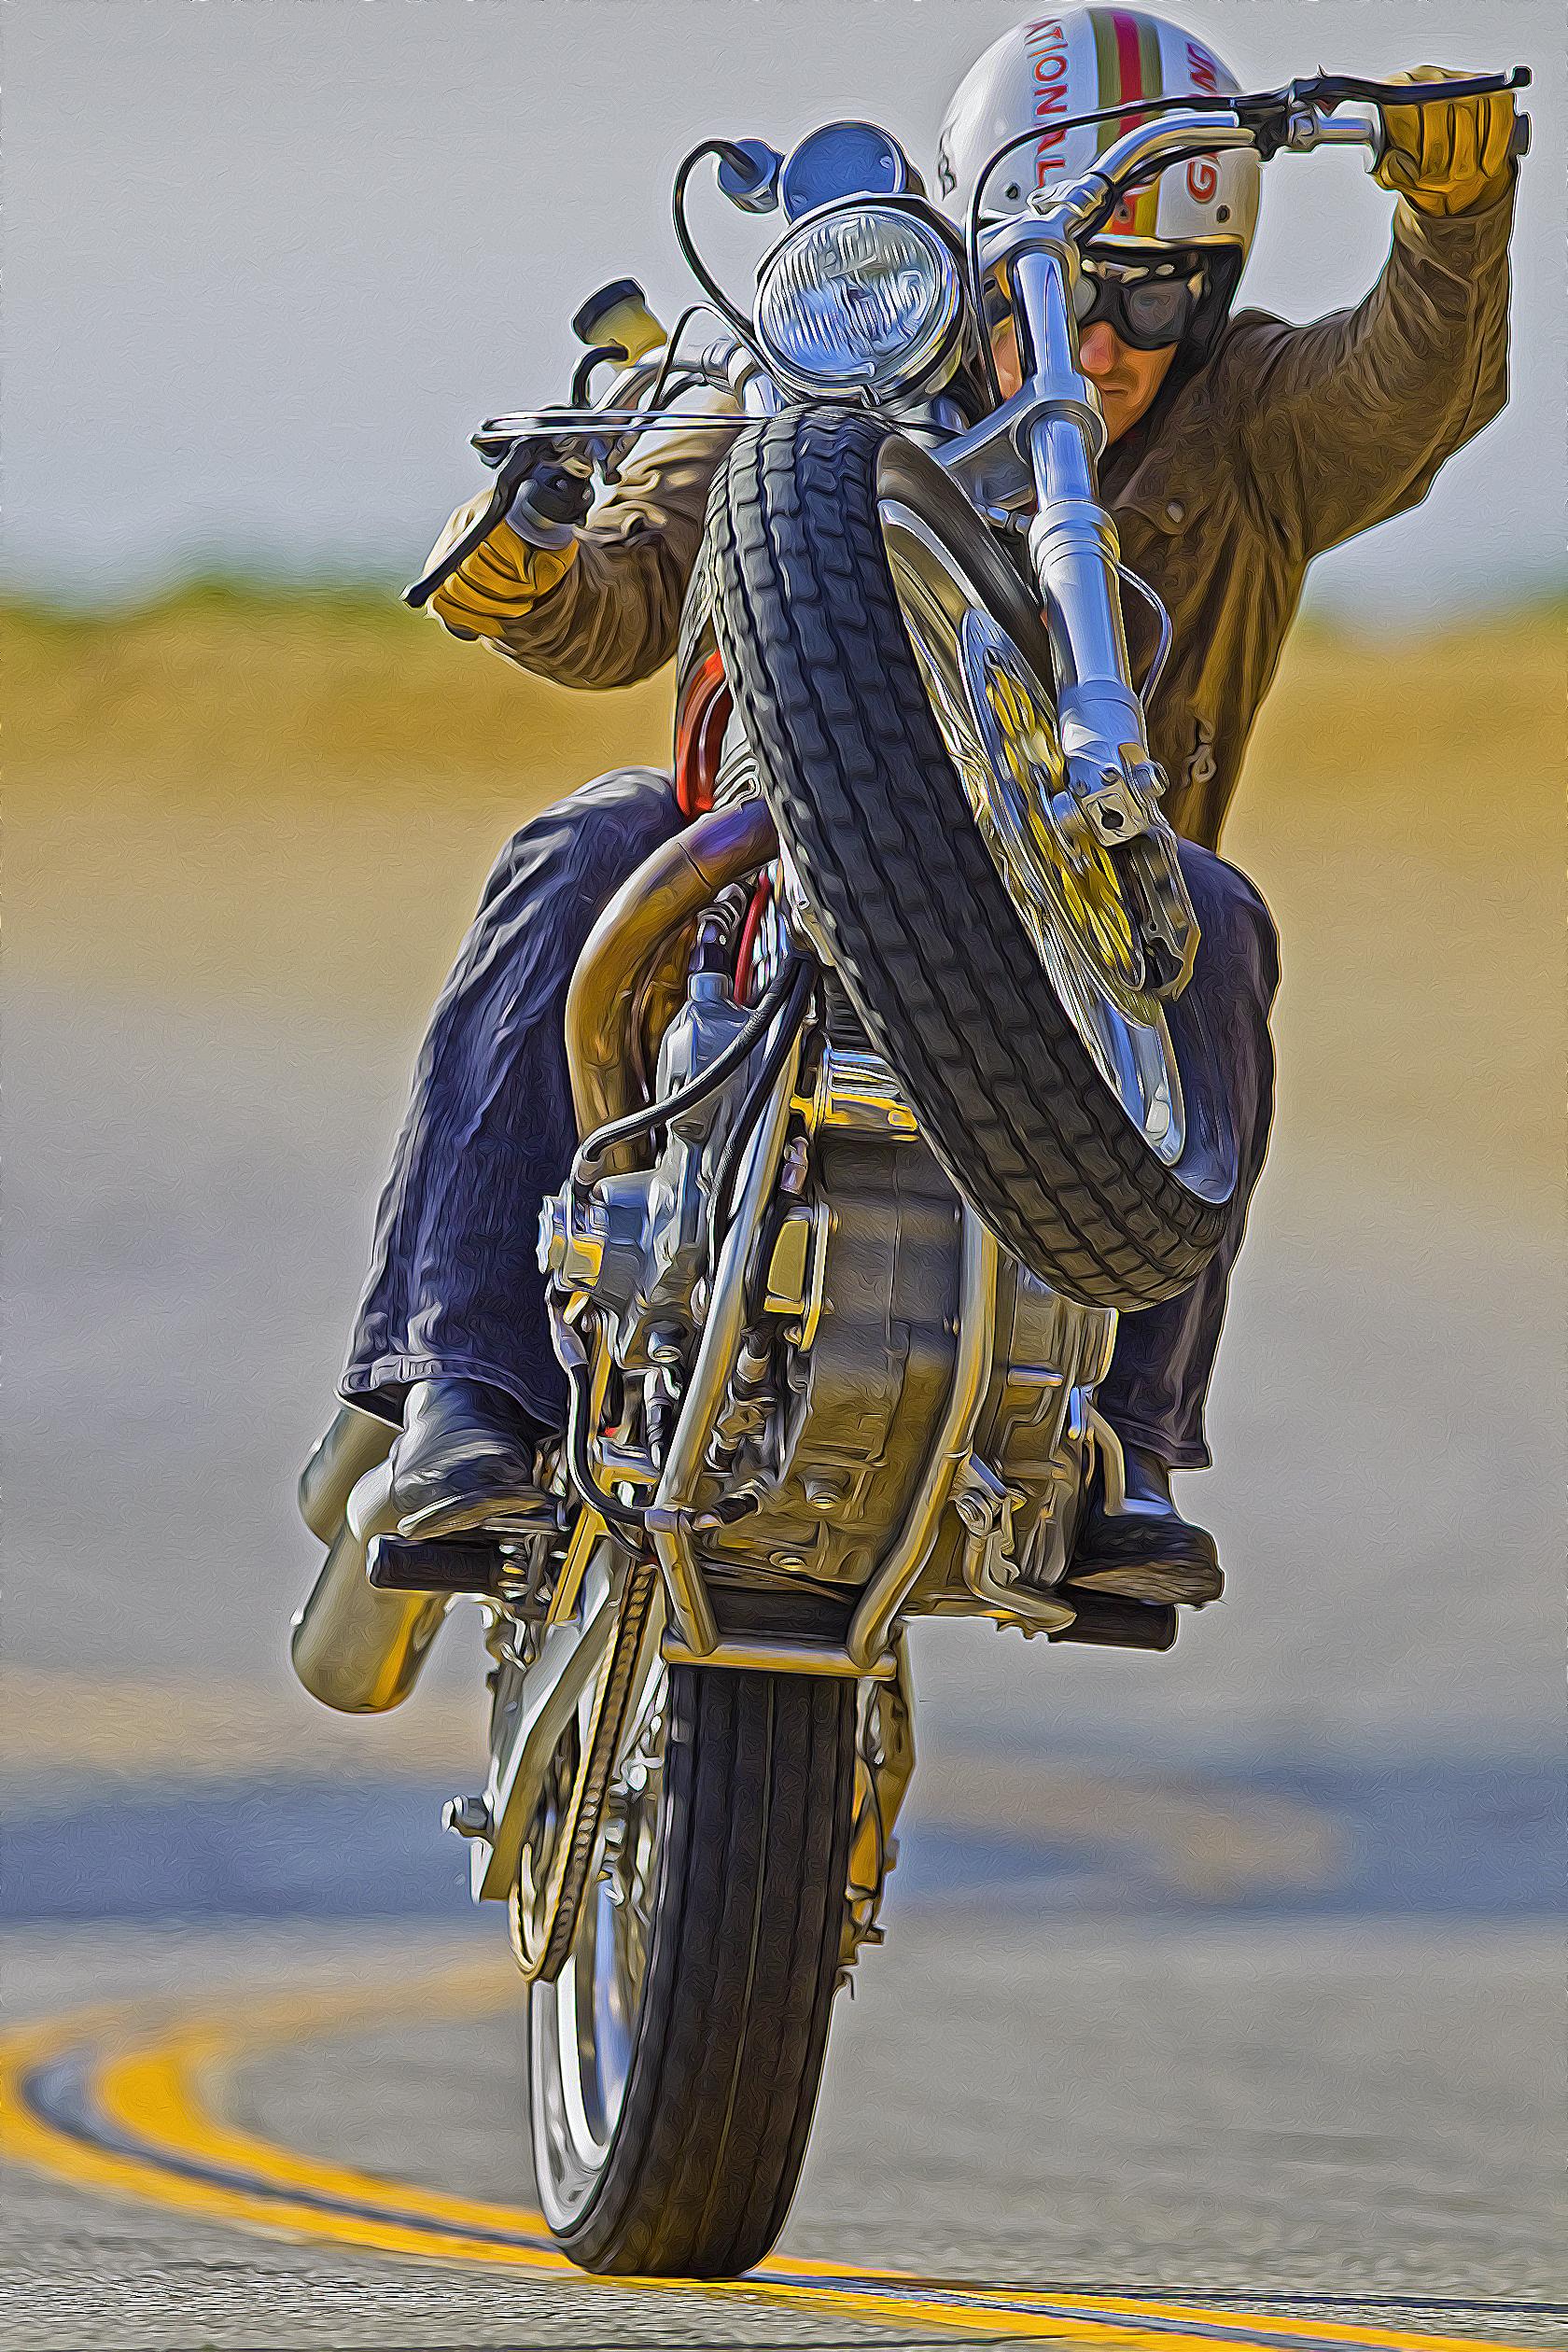 Mule Baisley    Rider Cernicky